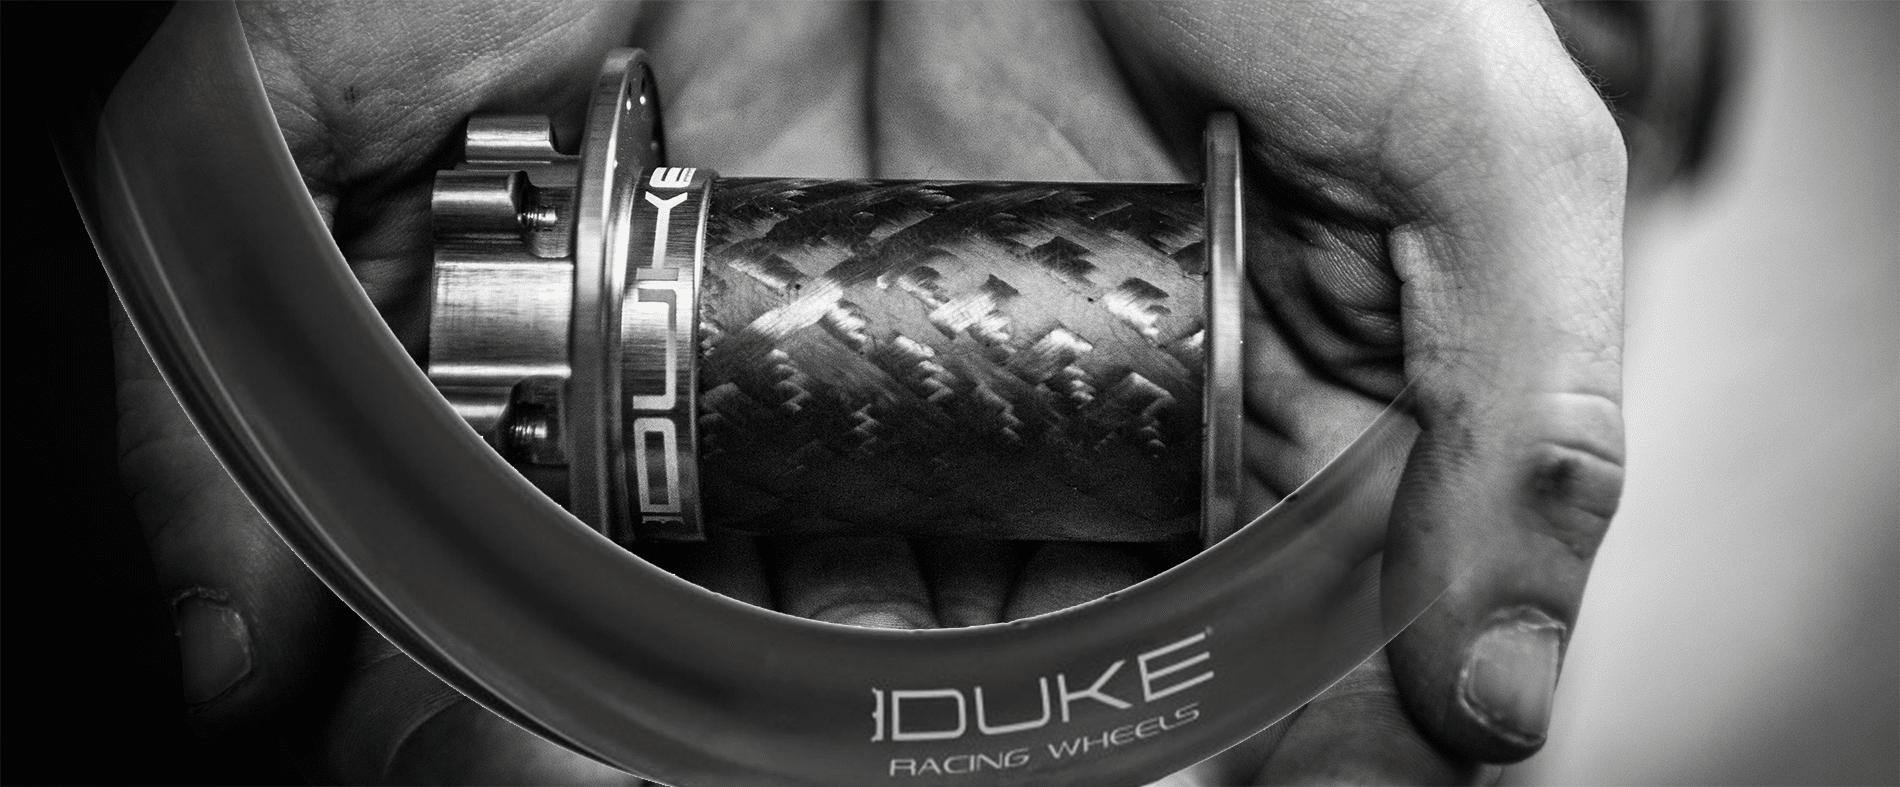 Duke wheels hubs